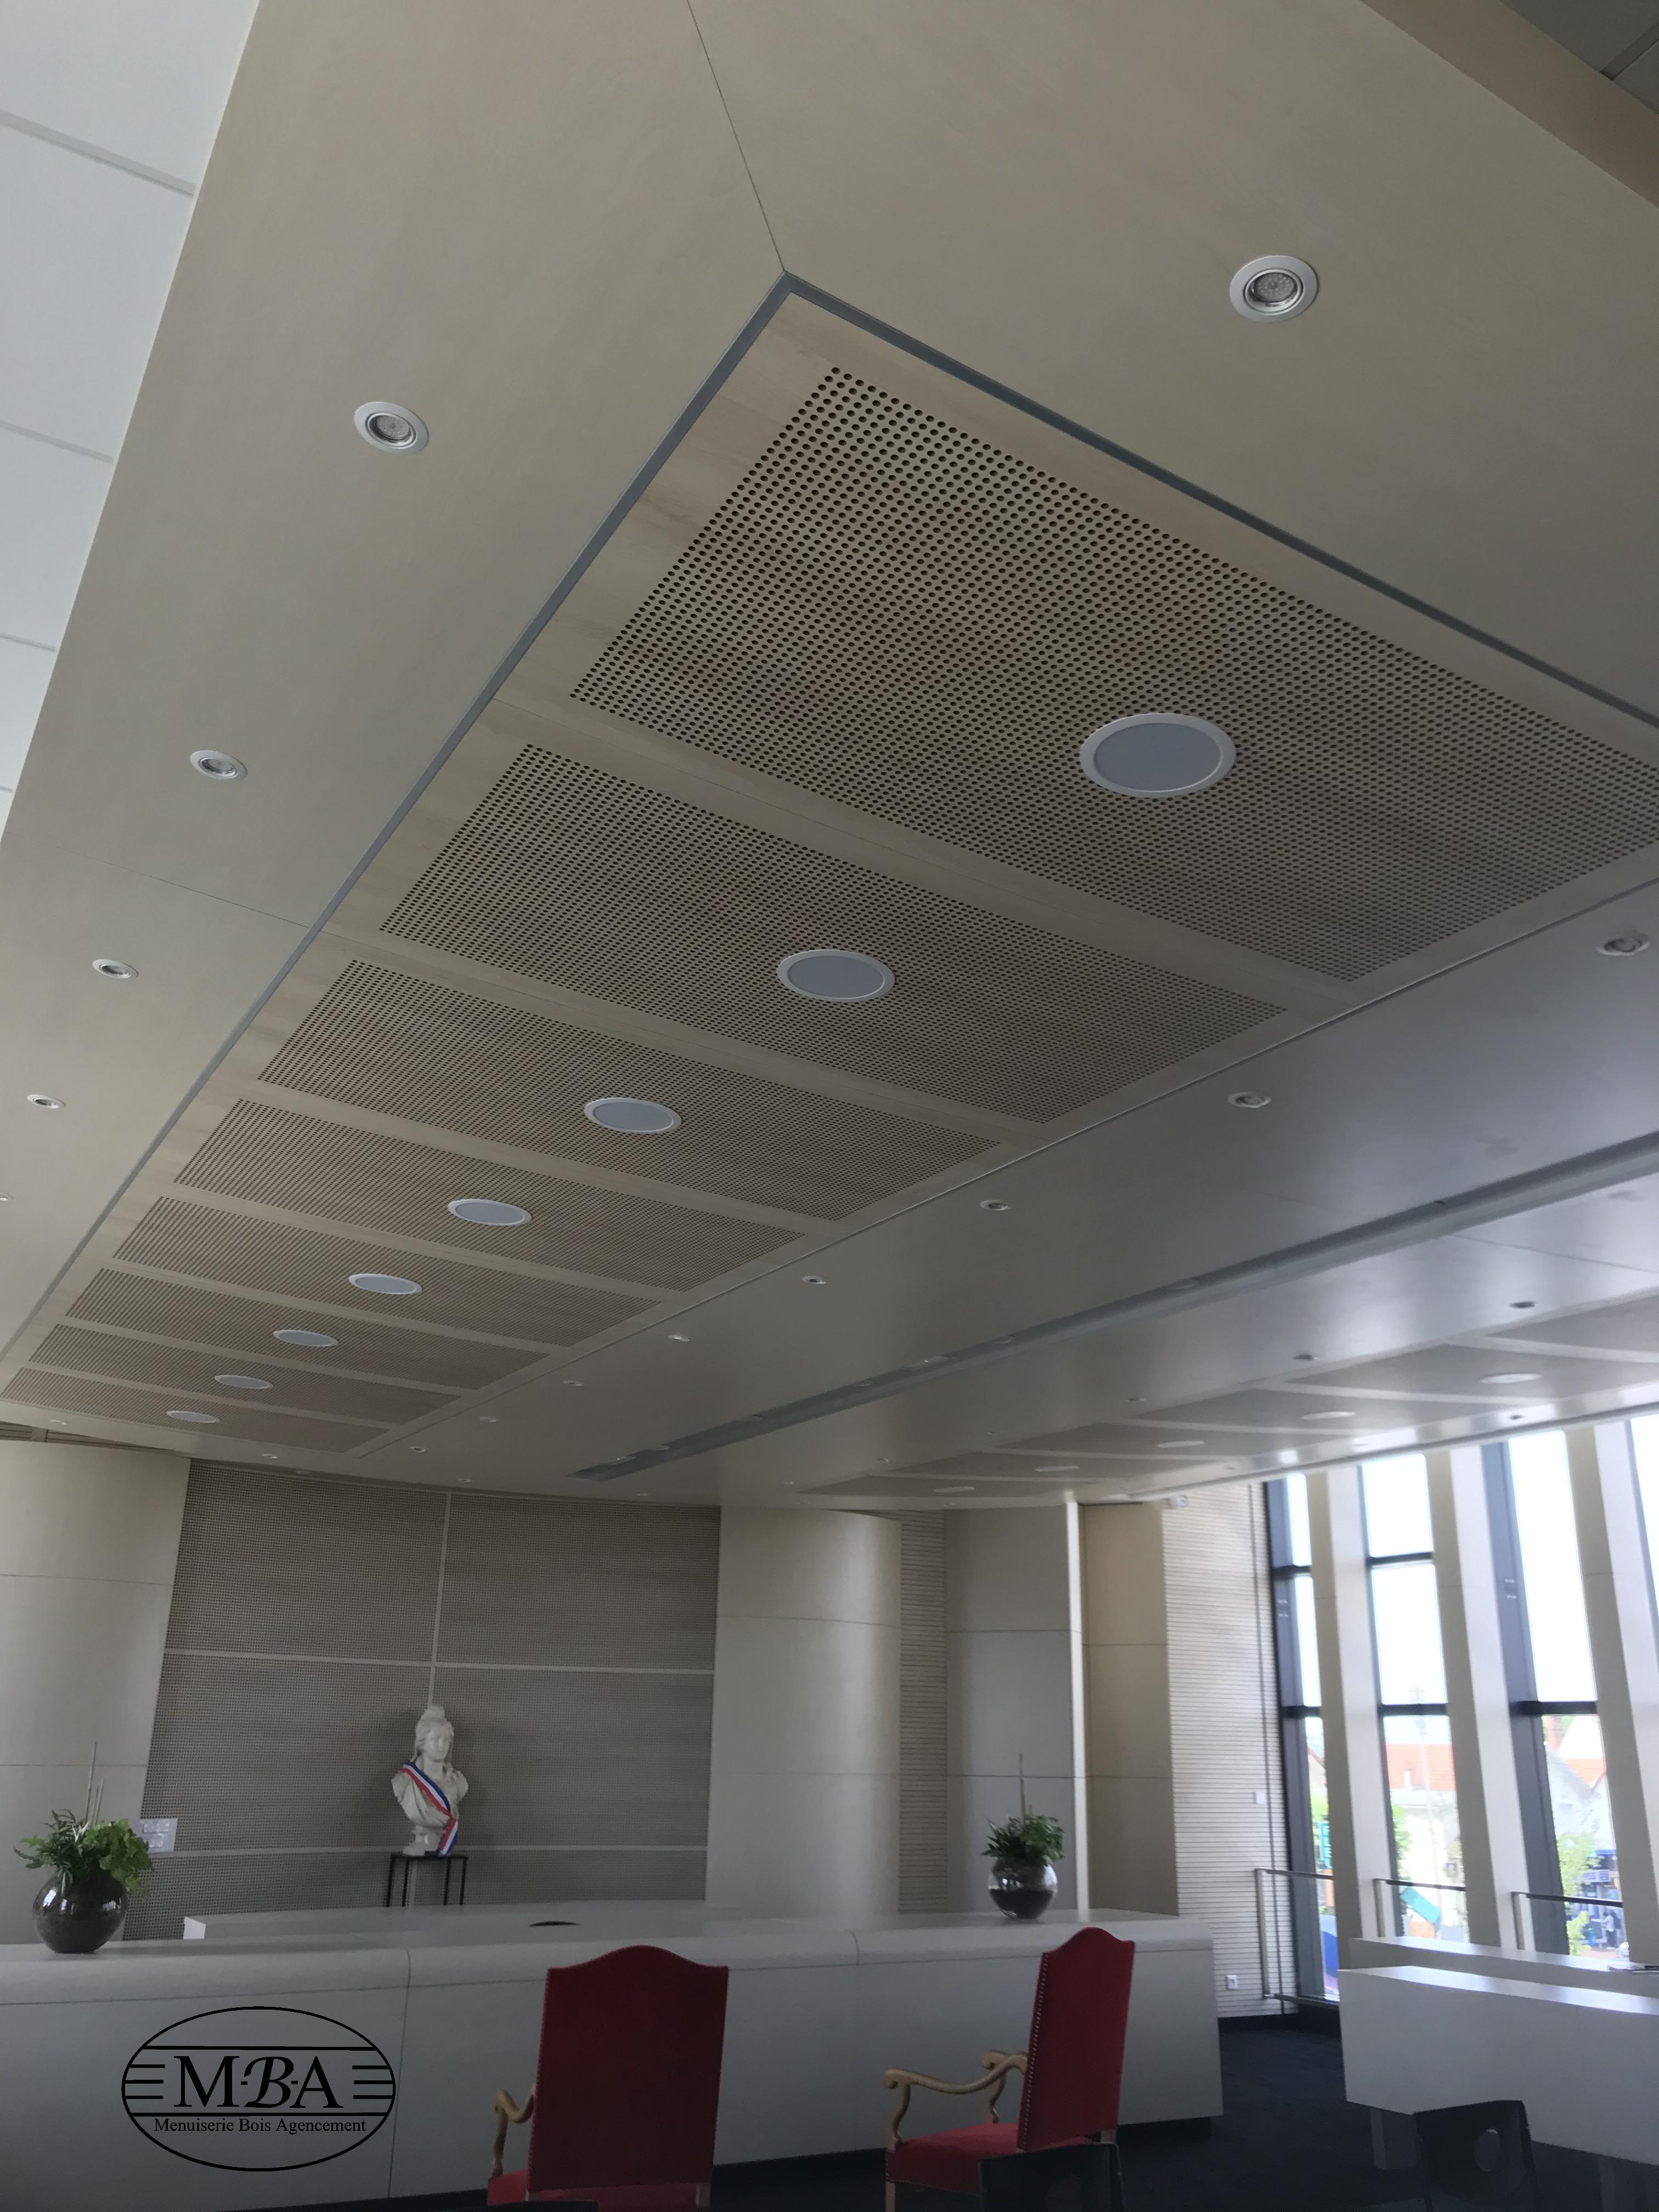 Plafond bois - Paray vieille poste